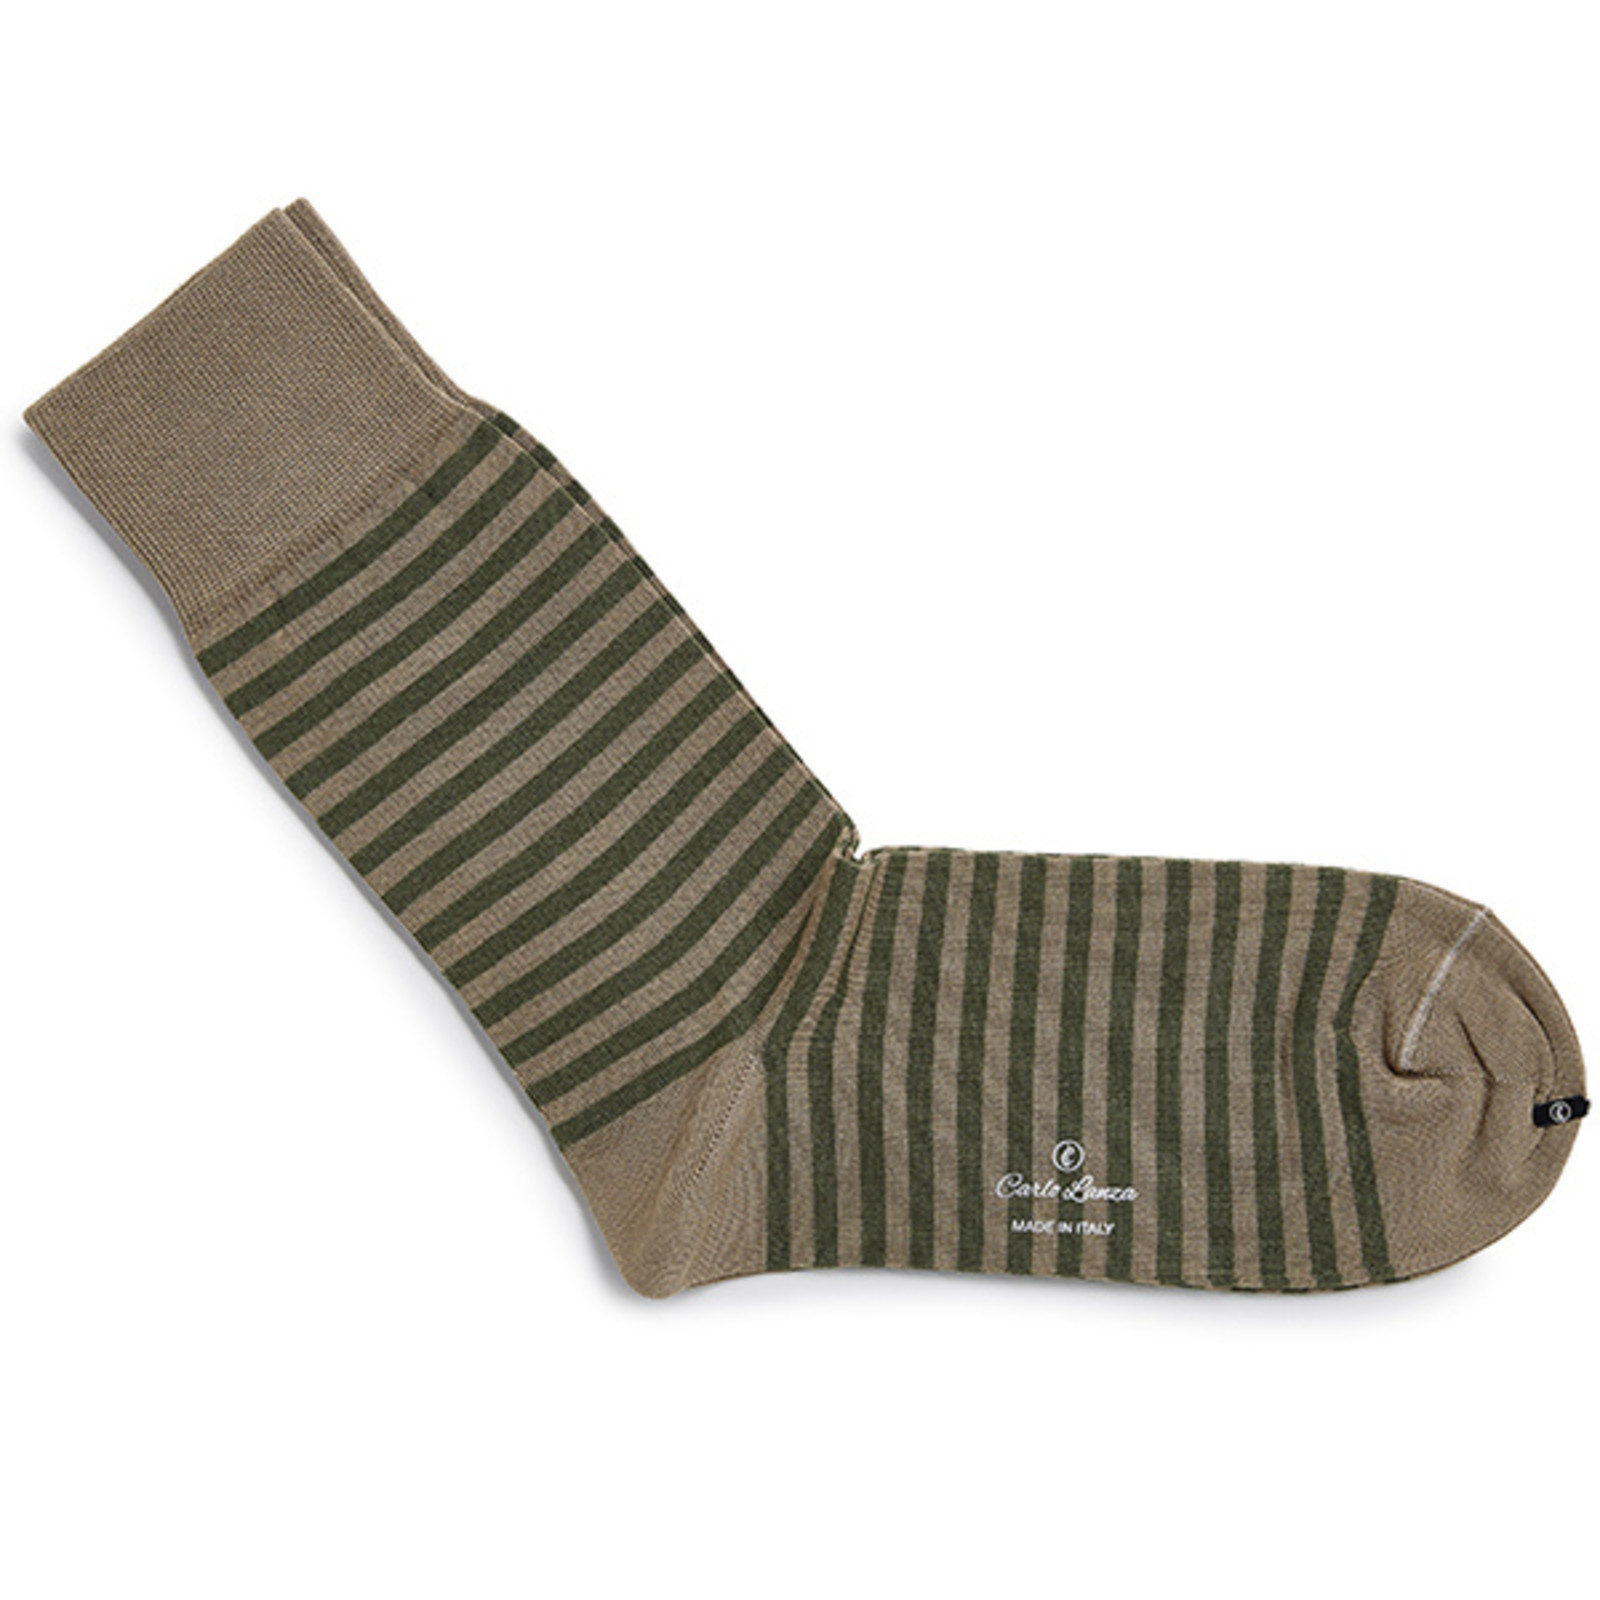 Carlo Lanza Olive stripe socks